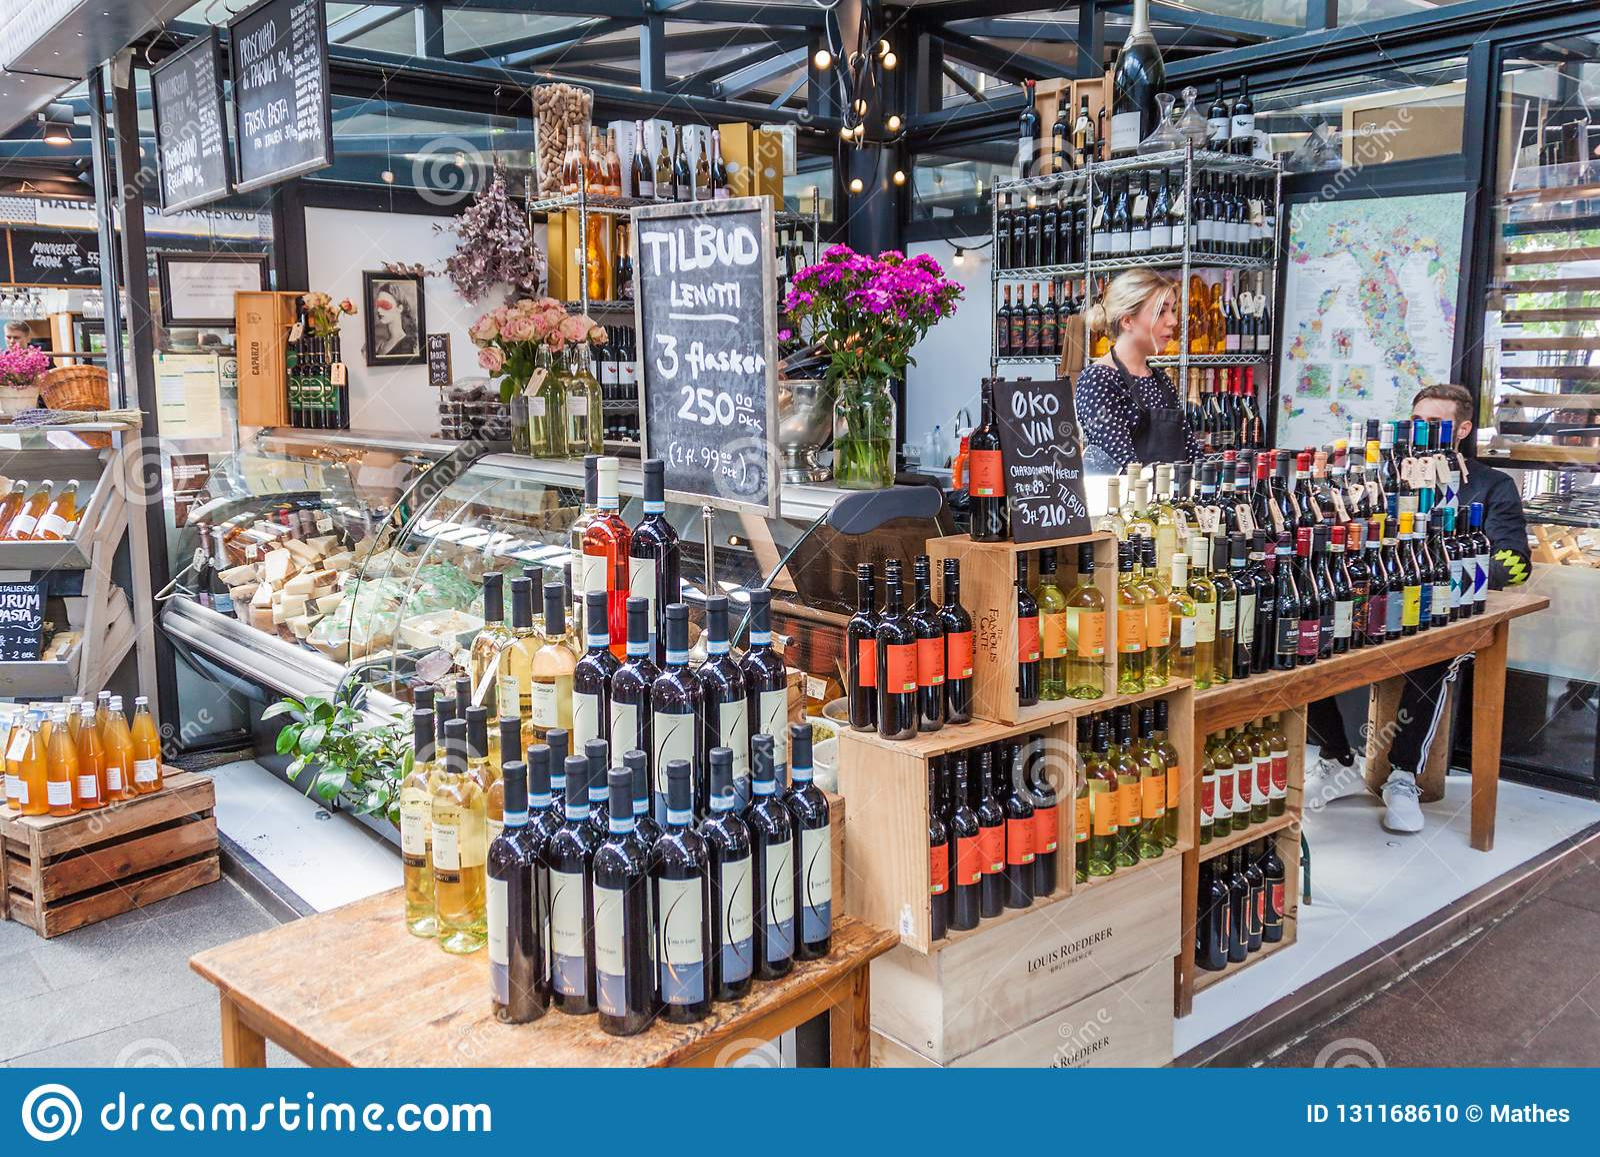 COPENHAGEN, DENMARK - AUGUST 28, 2016: Wine and cheese stall inTorvehallerne indoor food market in the centre of